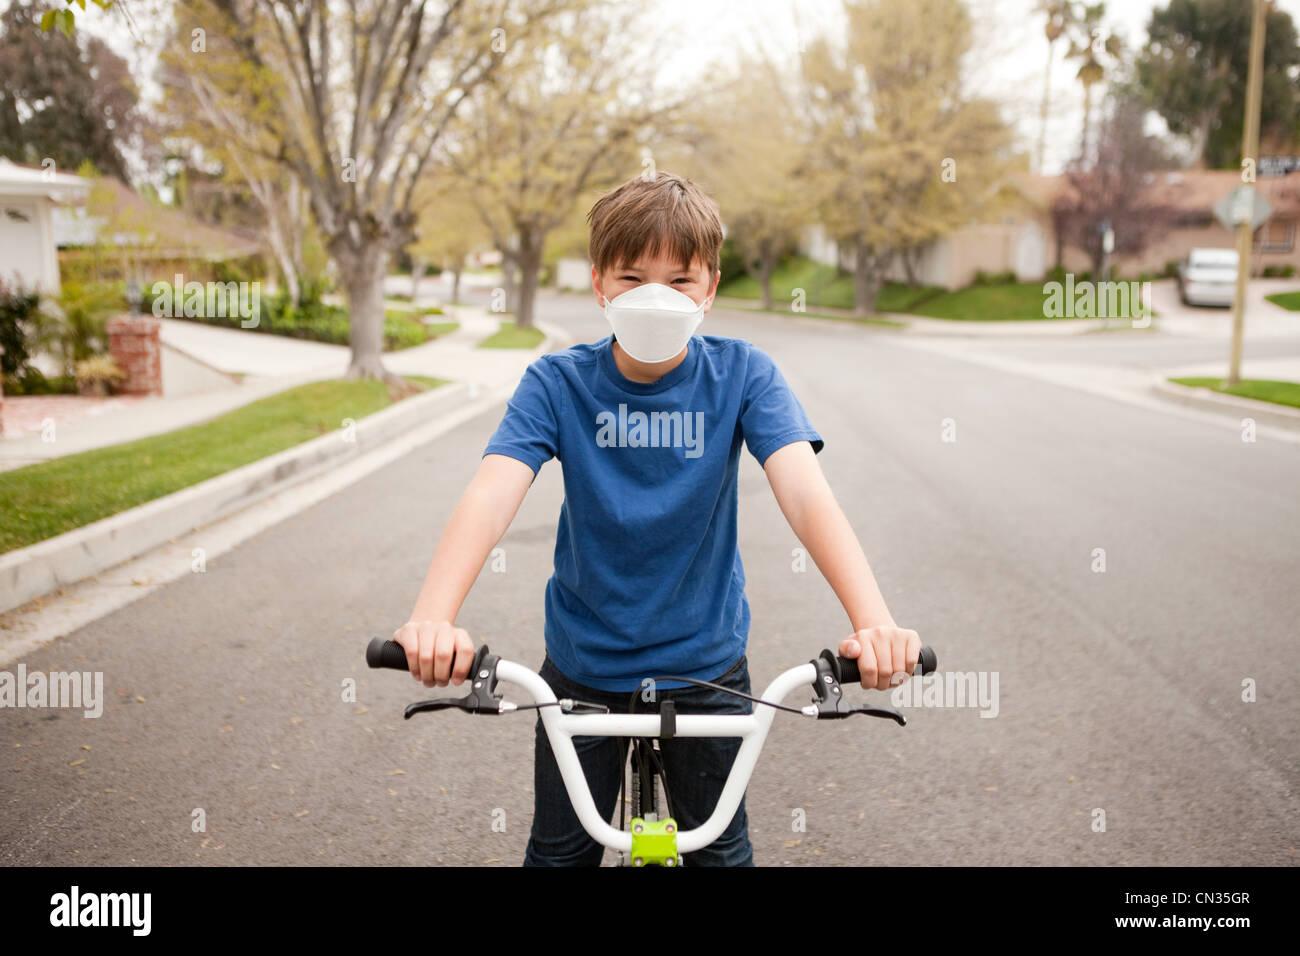 Boy on bicycle wearing dust mask - Stock Image